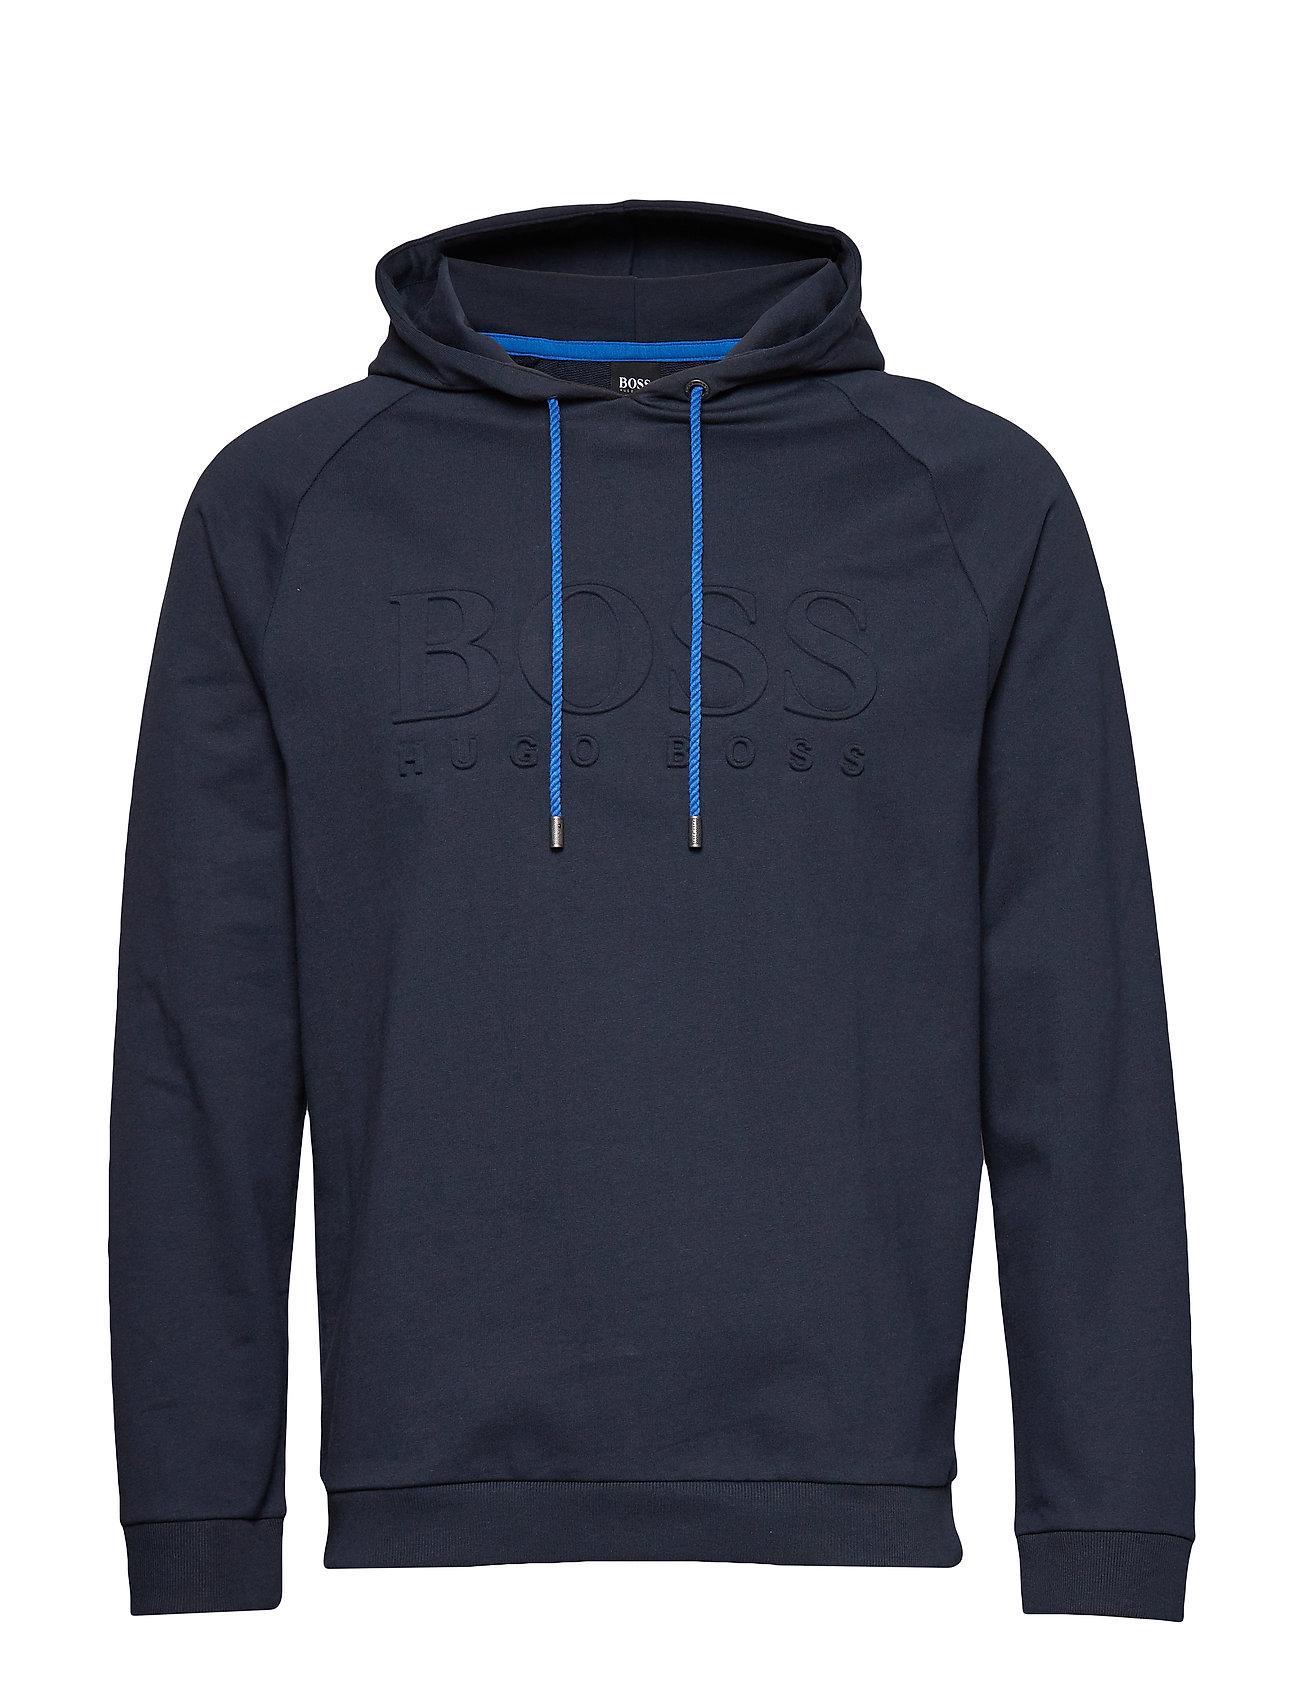 BOSS Business Heritage Sweatshirt - DARK BLUE